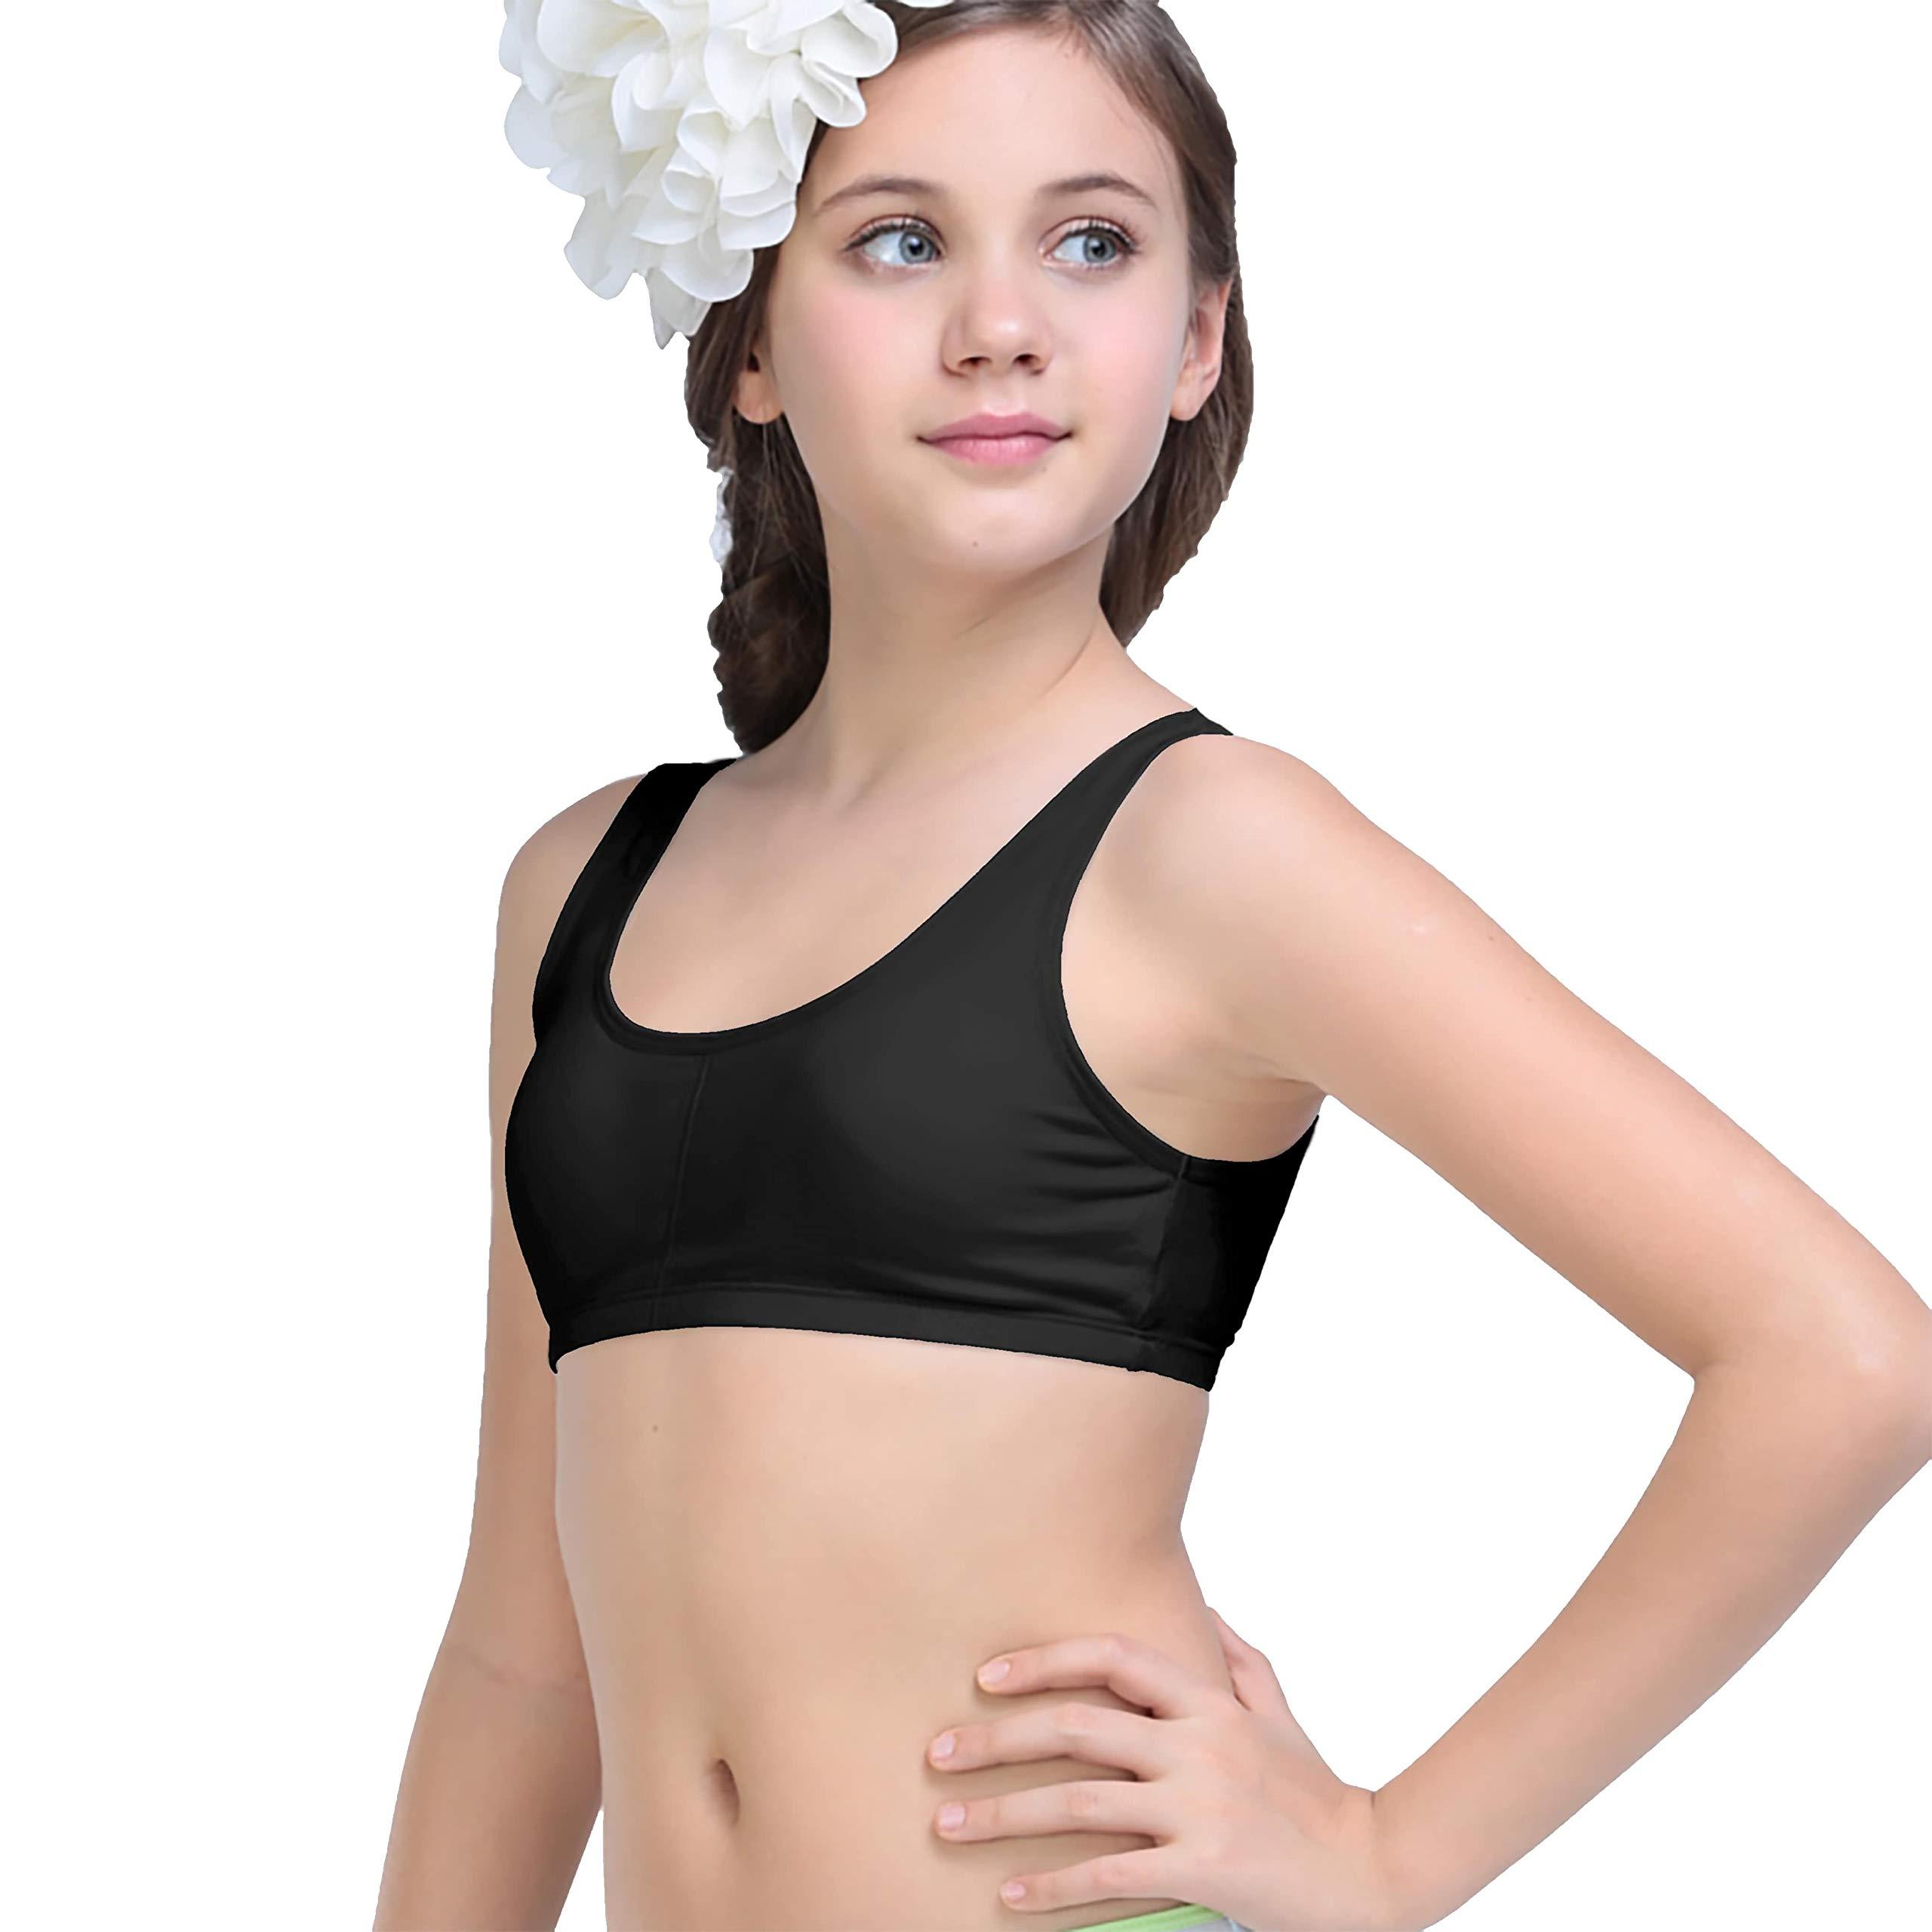 ADMIRE Girls Cotton Sport TOP PACKOF2 (11-12 Years, Black) (B07QBLFZWY) Amazon Price History, Amazon Price Tracker